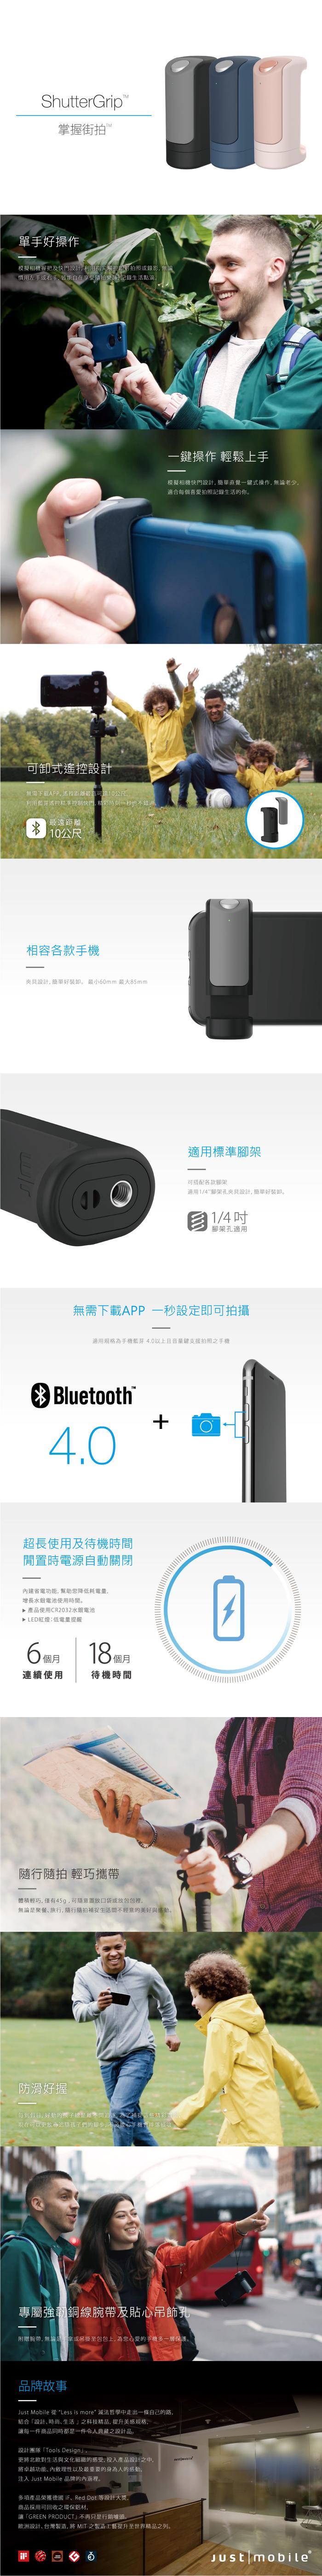 ShutterGrip™ [掌握街拍] 讓手機拍照更犀利